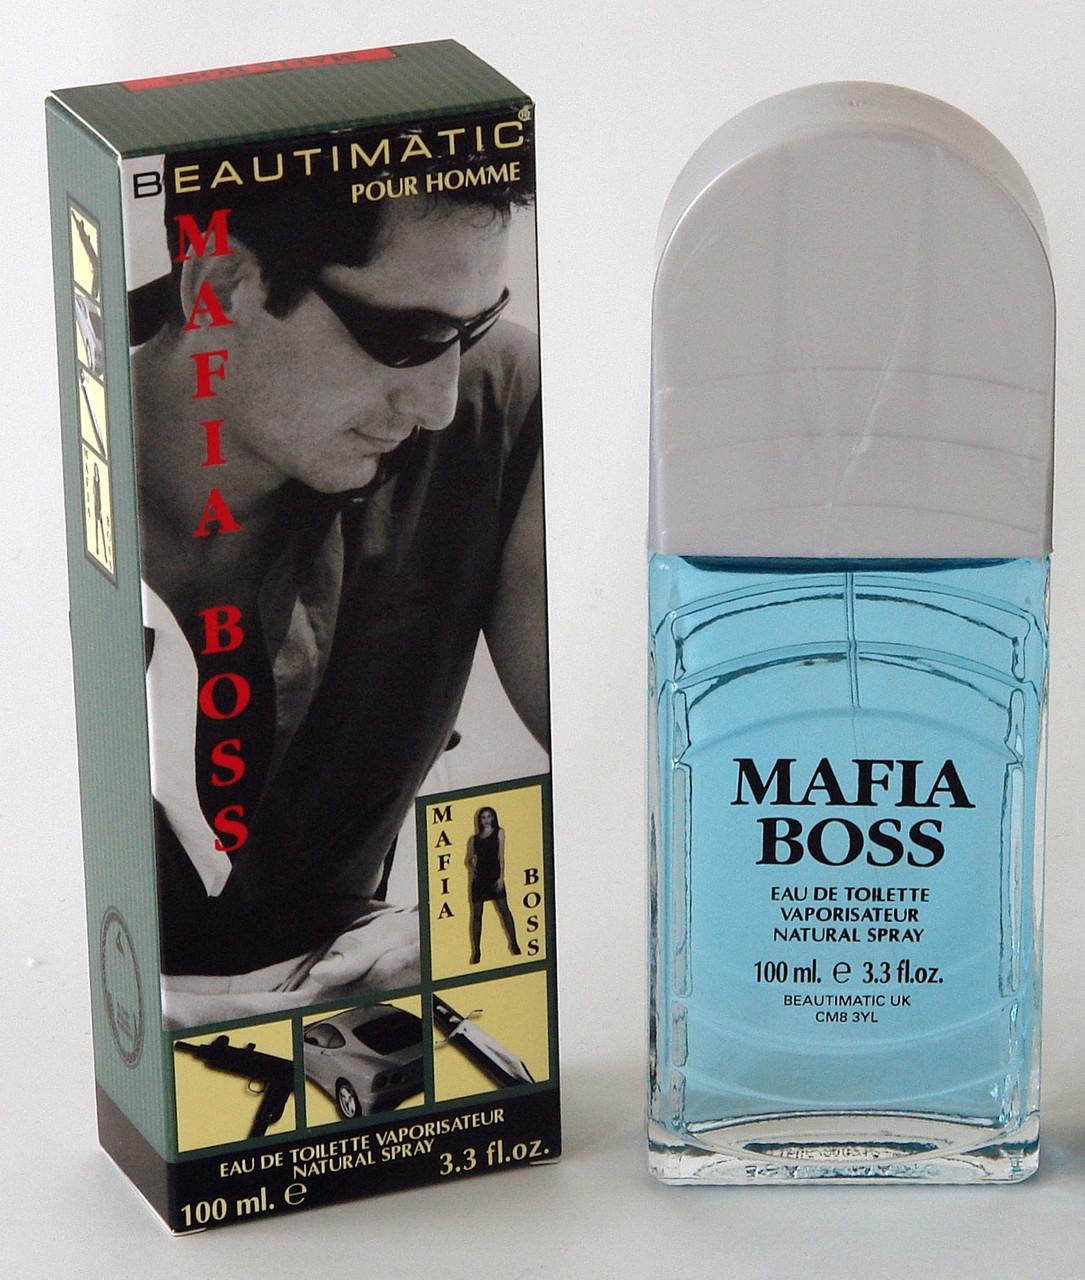 Beautimatic Mafia Boss(Бьютиматик Мафия Босс) мужская туалетная вода 100ml